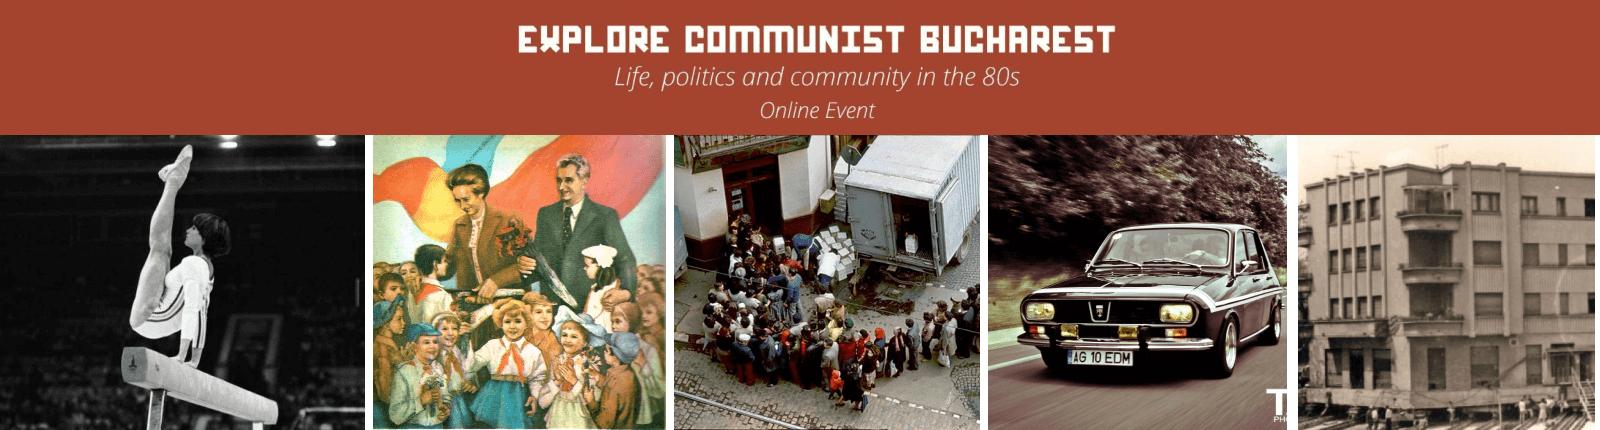 Explore Communist Bucharest - Life, Politics and Community